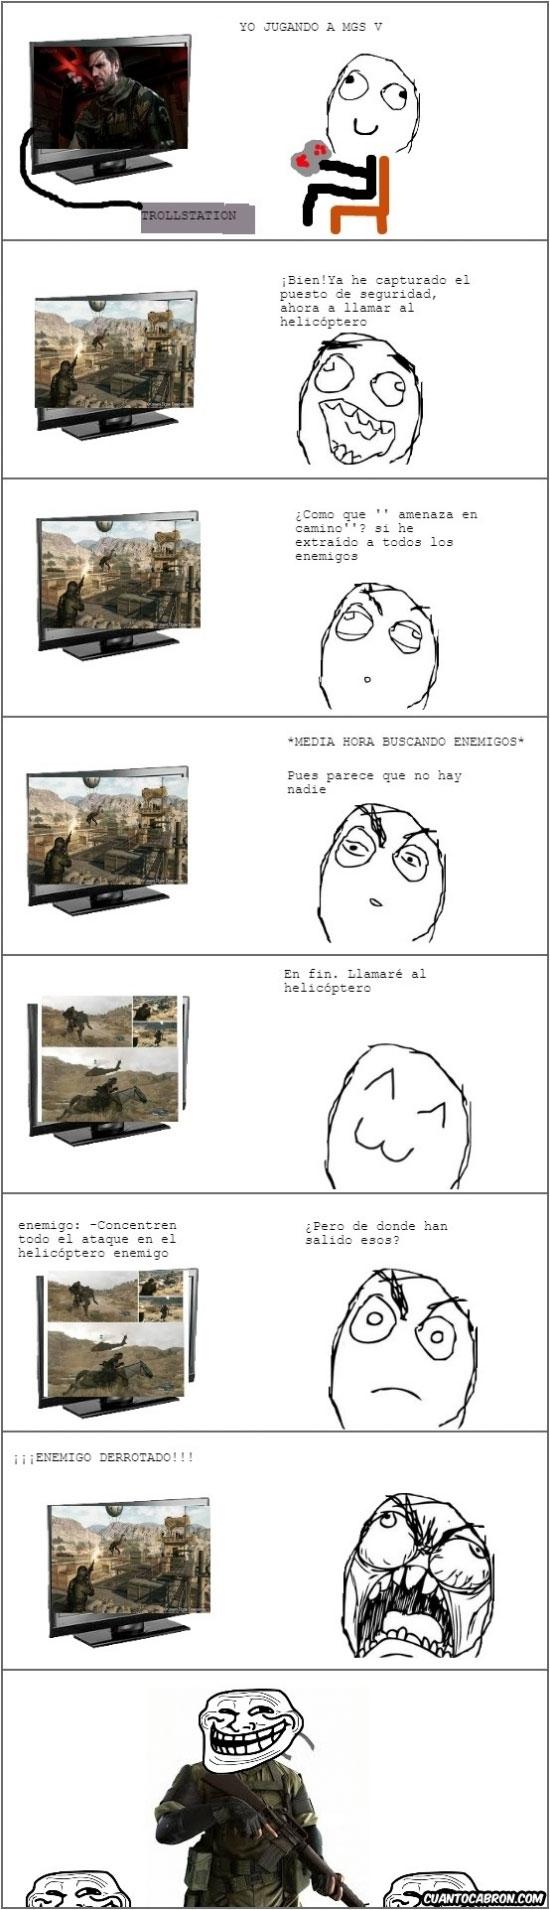 Ffffuuuuuuuuuu - Metal Gear Troll